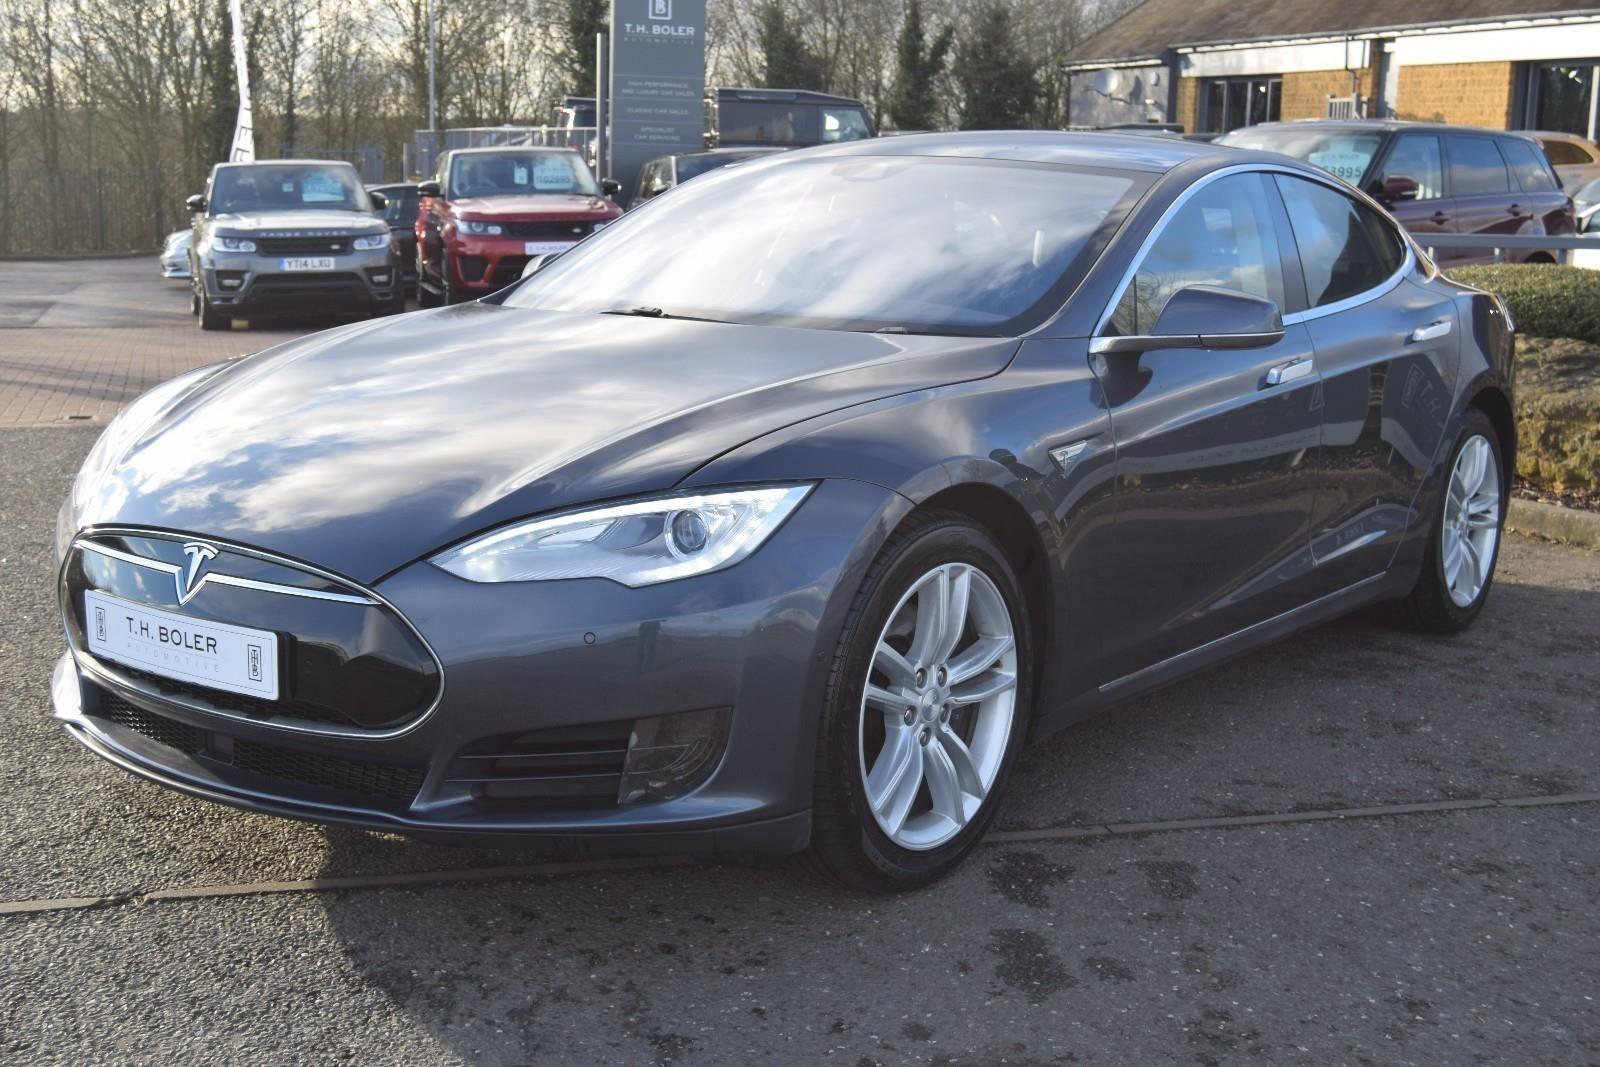 Used 2016 Tesla Model S 70 For Sale In Oxfordshire In 2021 Tesla Model S Tesla Model Tesla